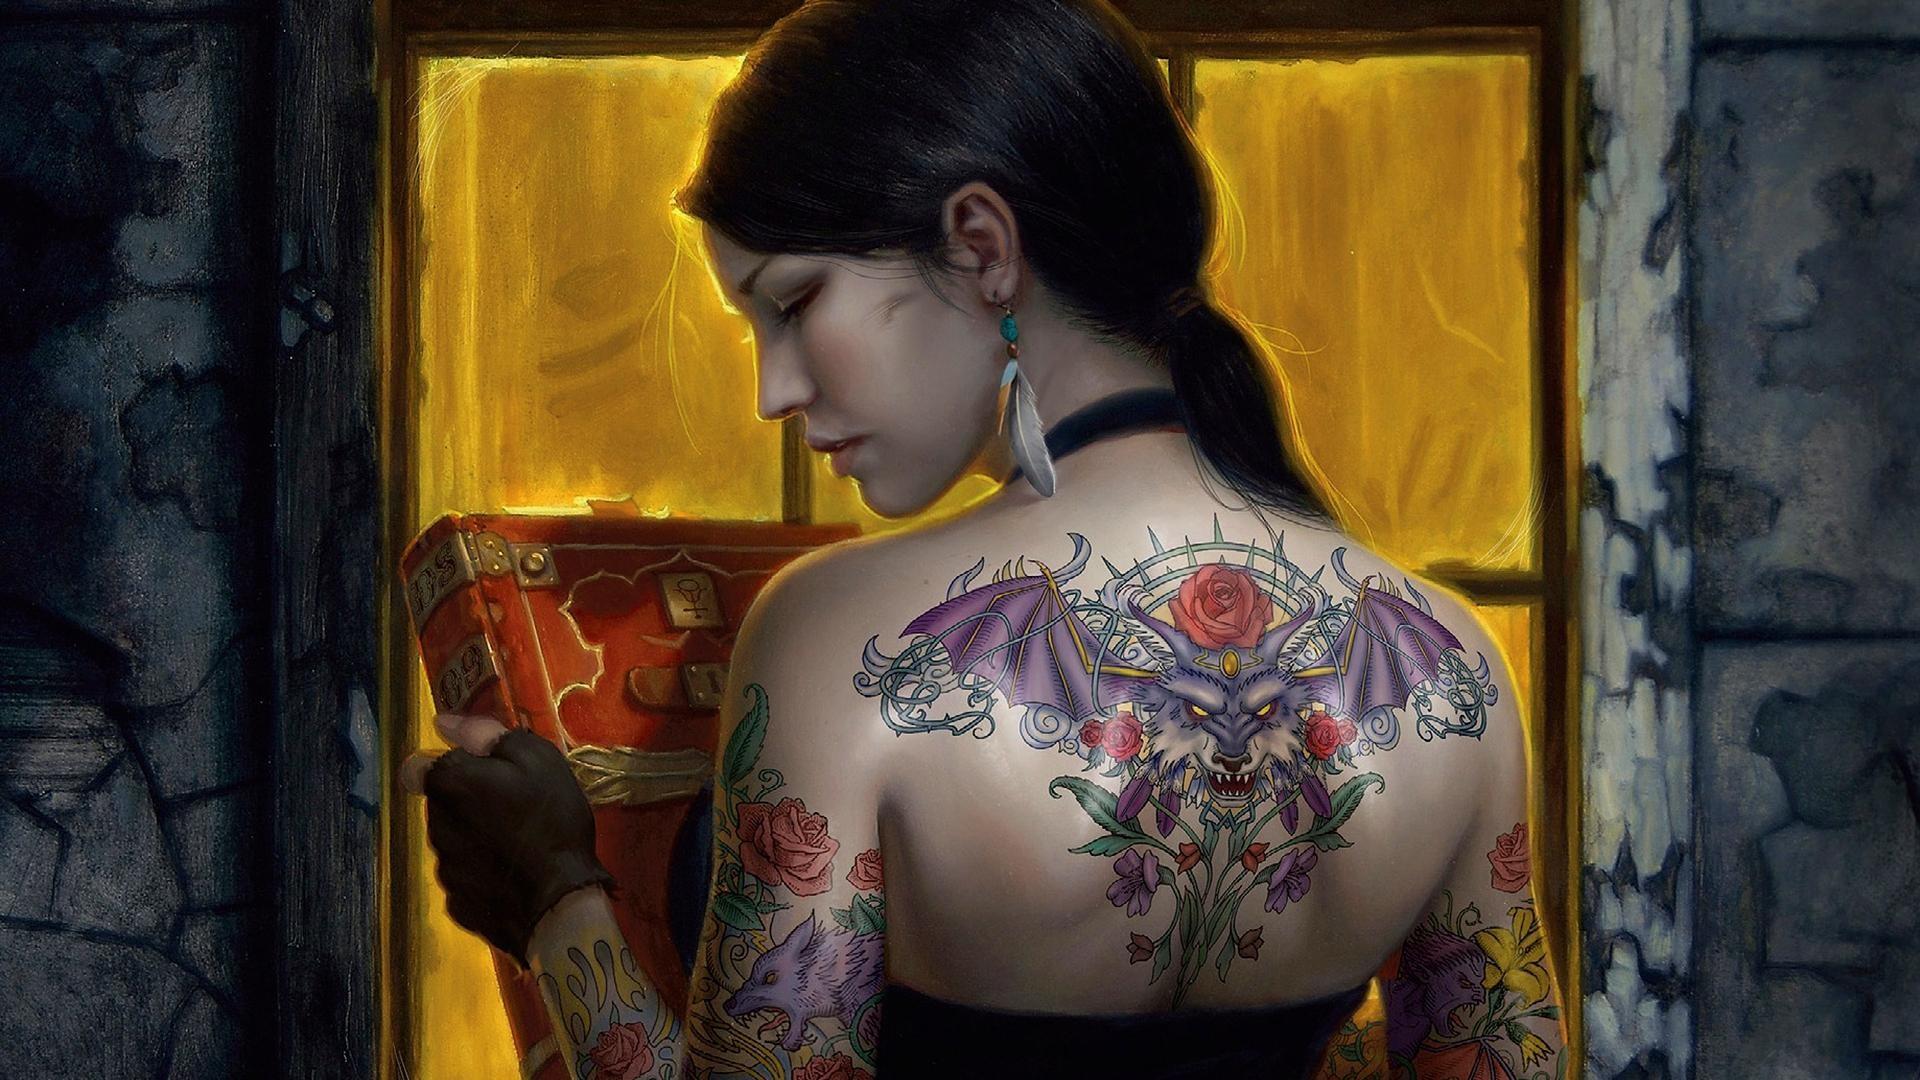 Wallpapers Koi Fish Tatto Girl With Oriental Tattoos Tattoo Girls .